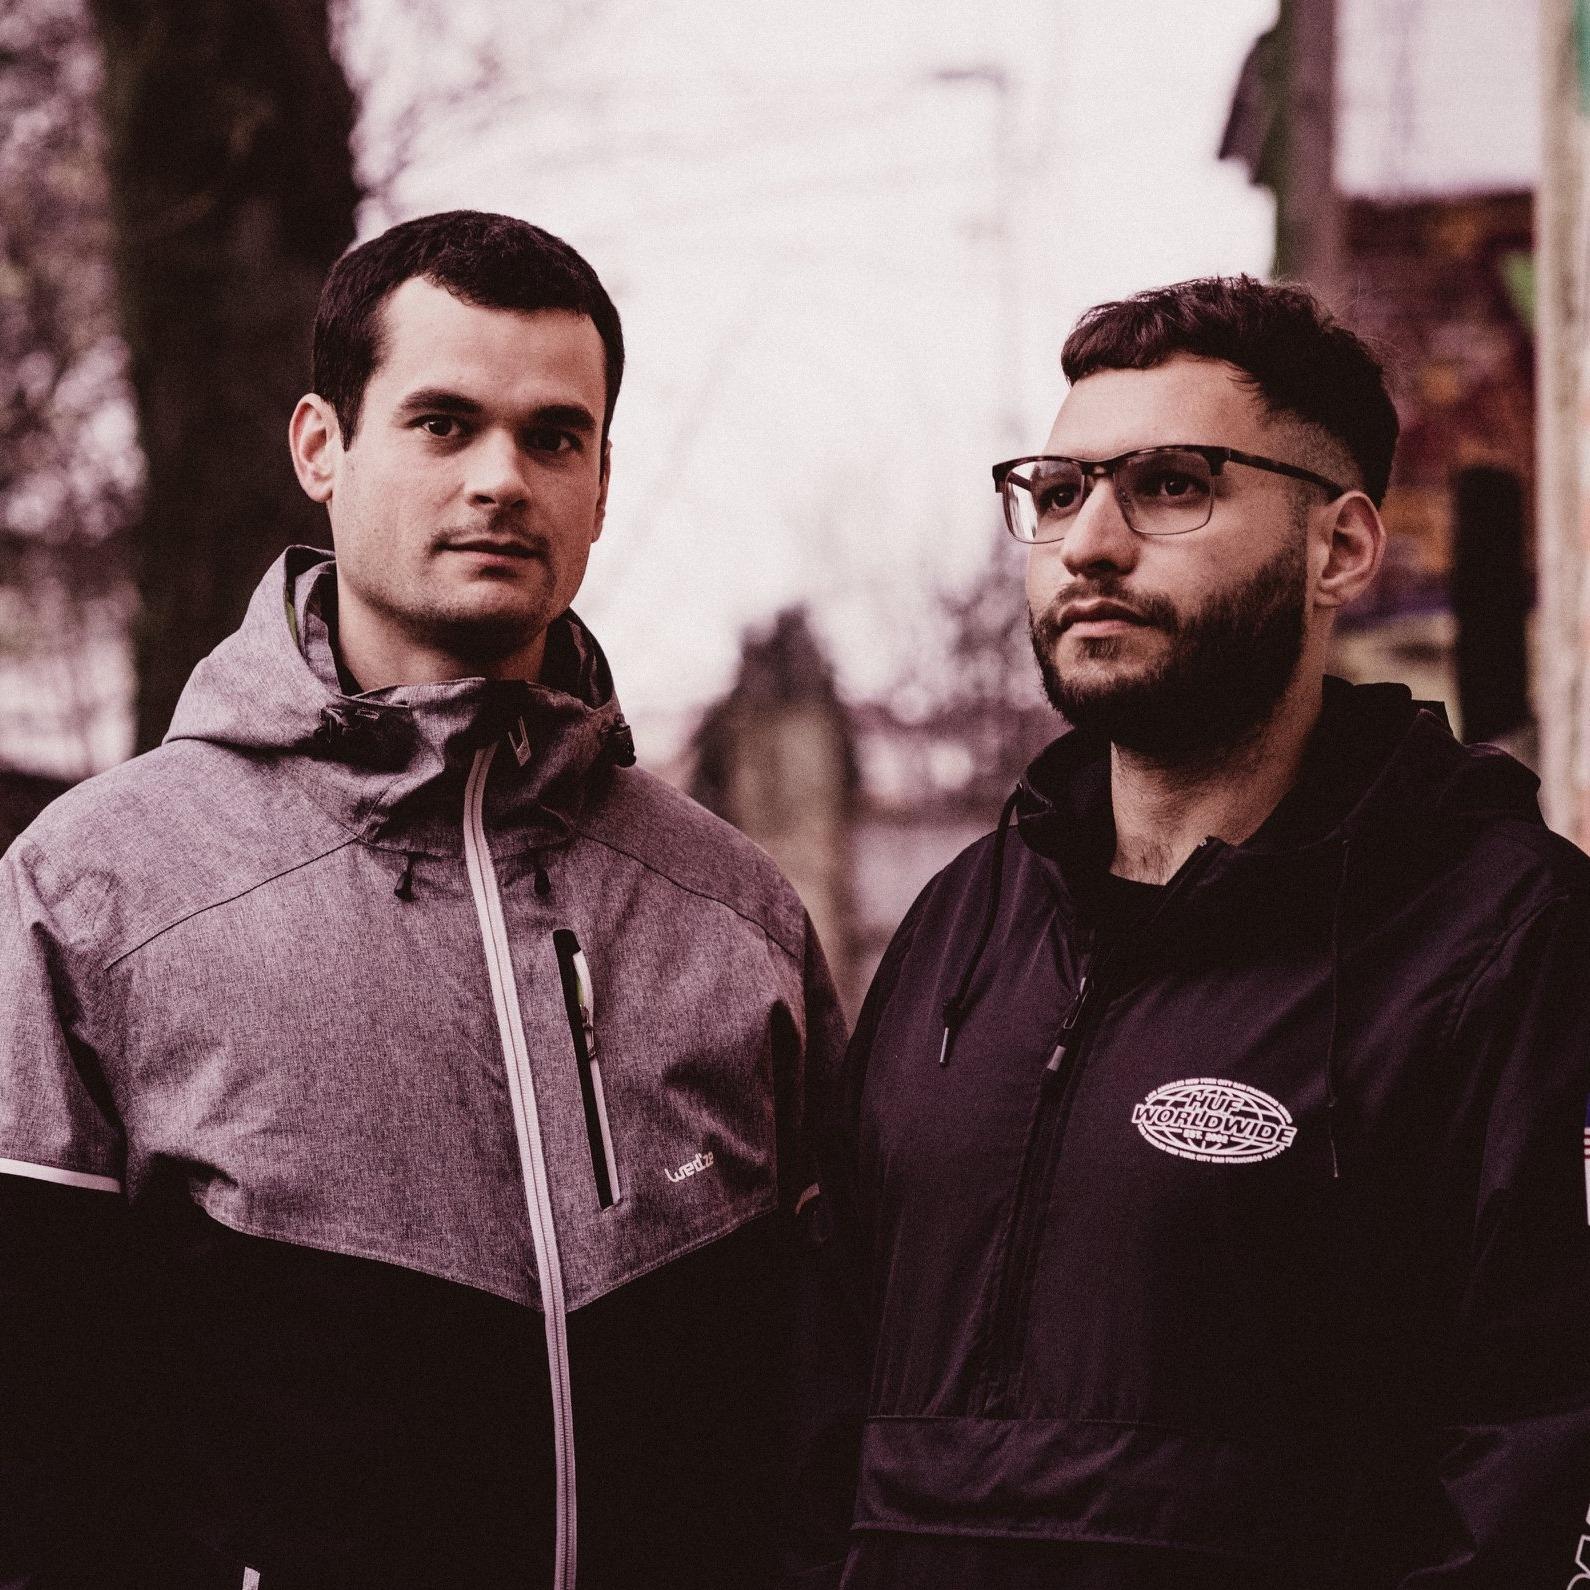 ZeroZero Drum & Bass Producer